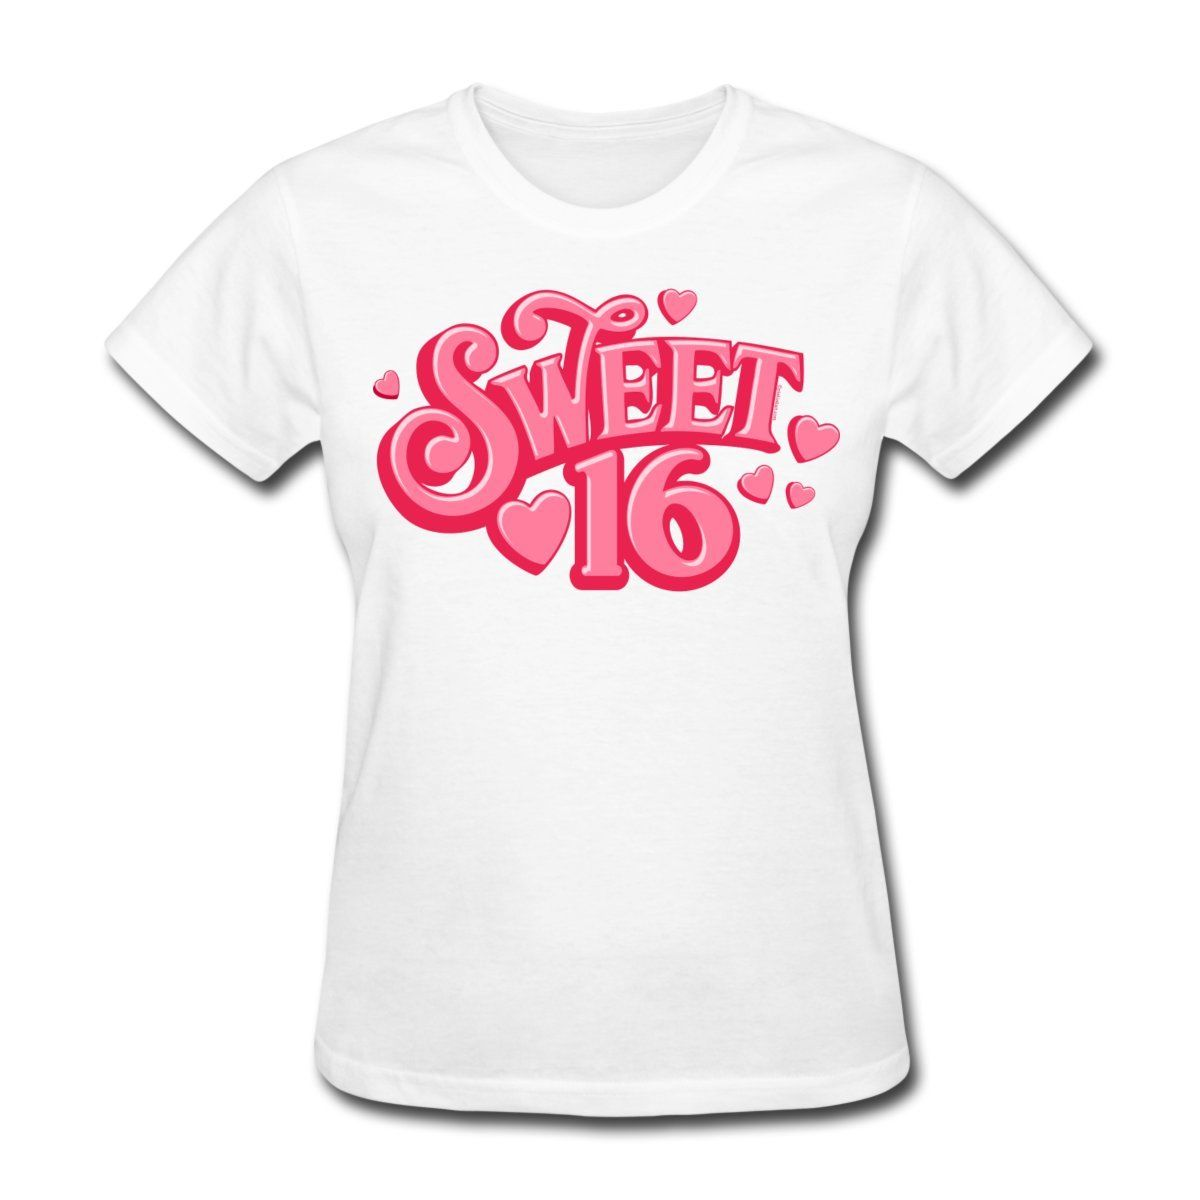 Design your own t-shirt hot pink - Hot Sell Women S Tees Summer Design Birthday Sweet Sixteen Hearts Crew Neck Short Sleeve Womens T Shirts Make Your Own Shirt